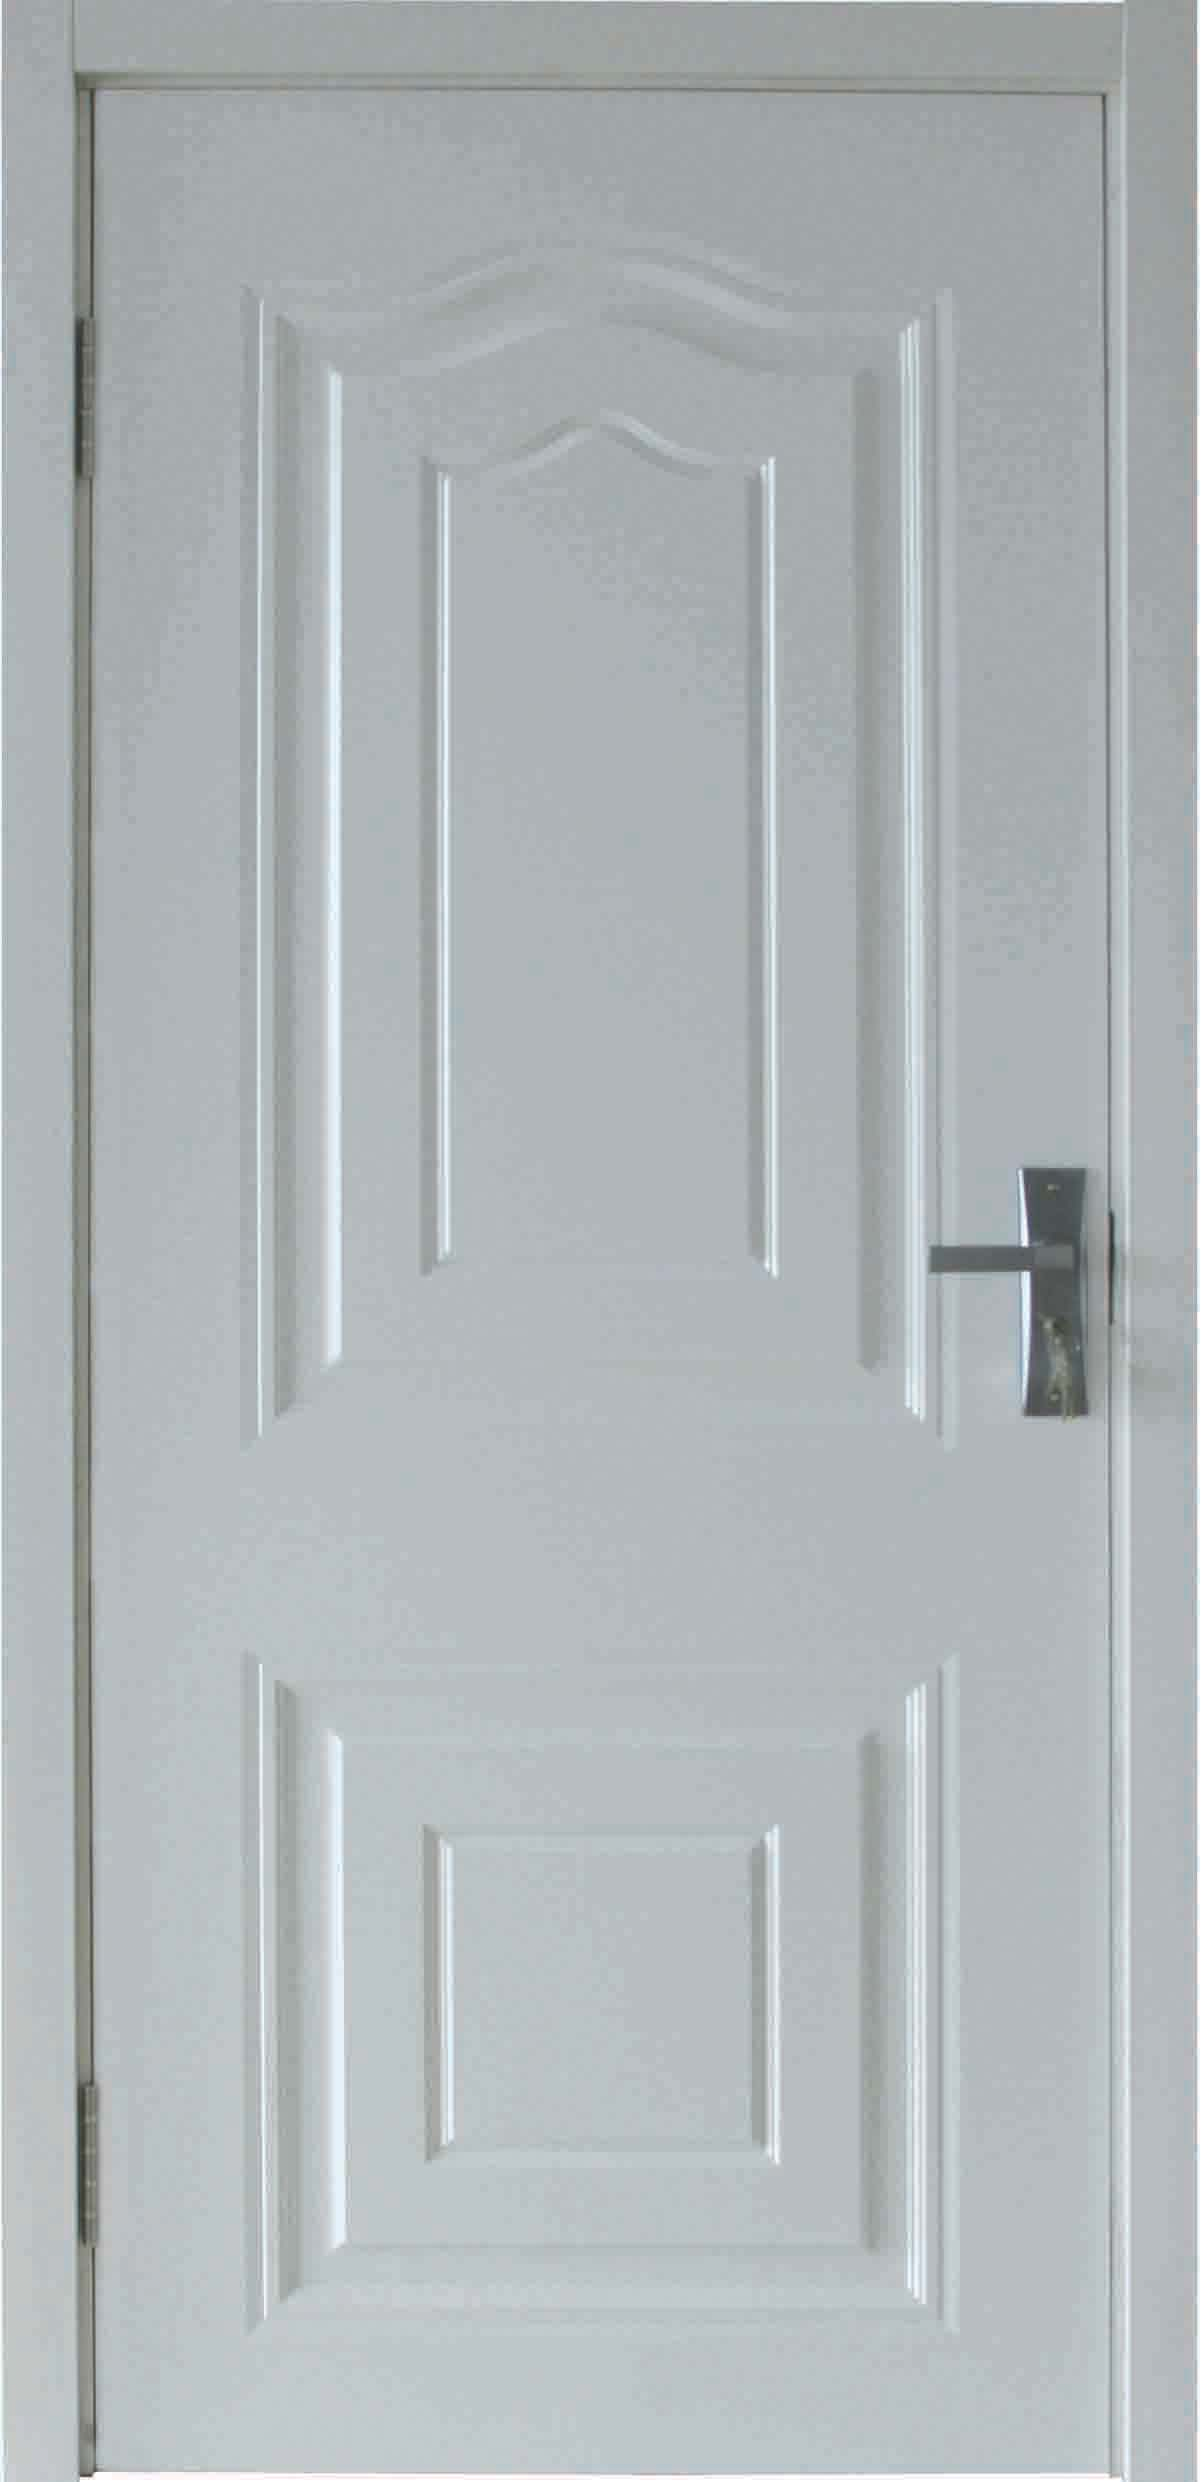 Alluring 20 White Door Texture Inspiration Design Of Fine